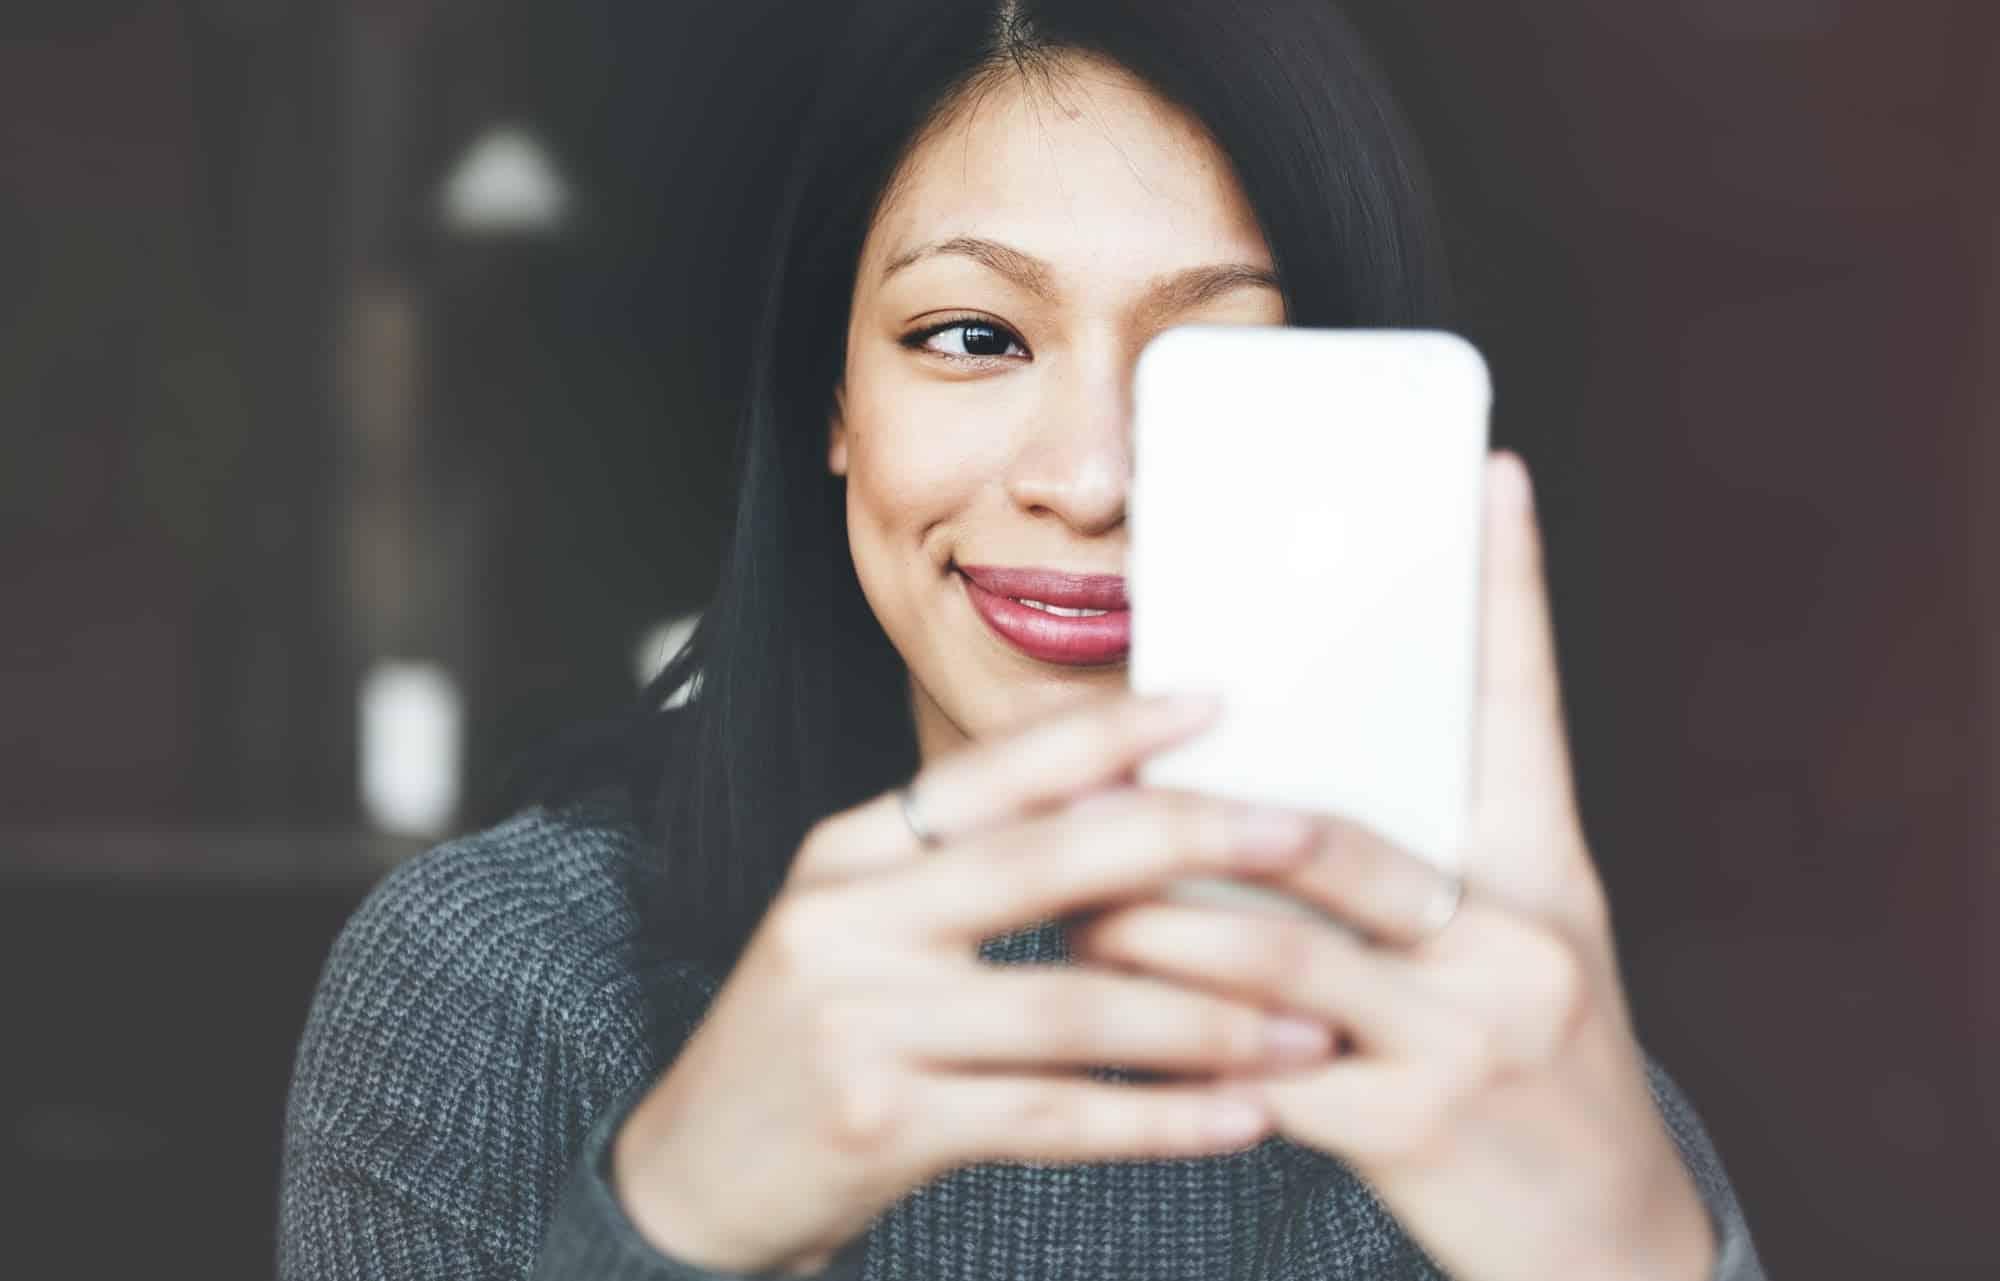 Portrait Smiling Technology Selfie Mobile Phone